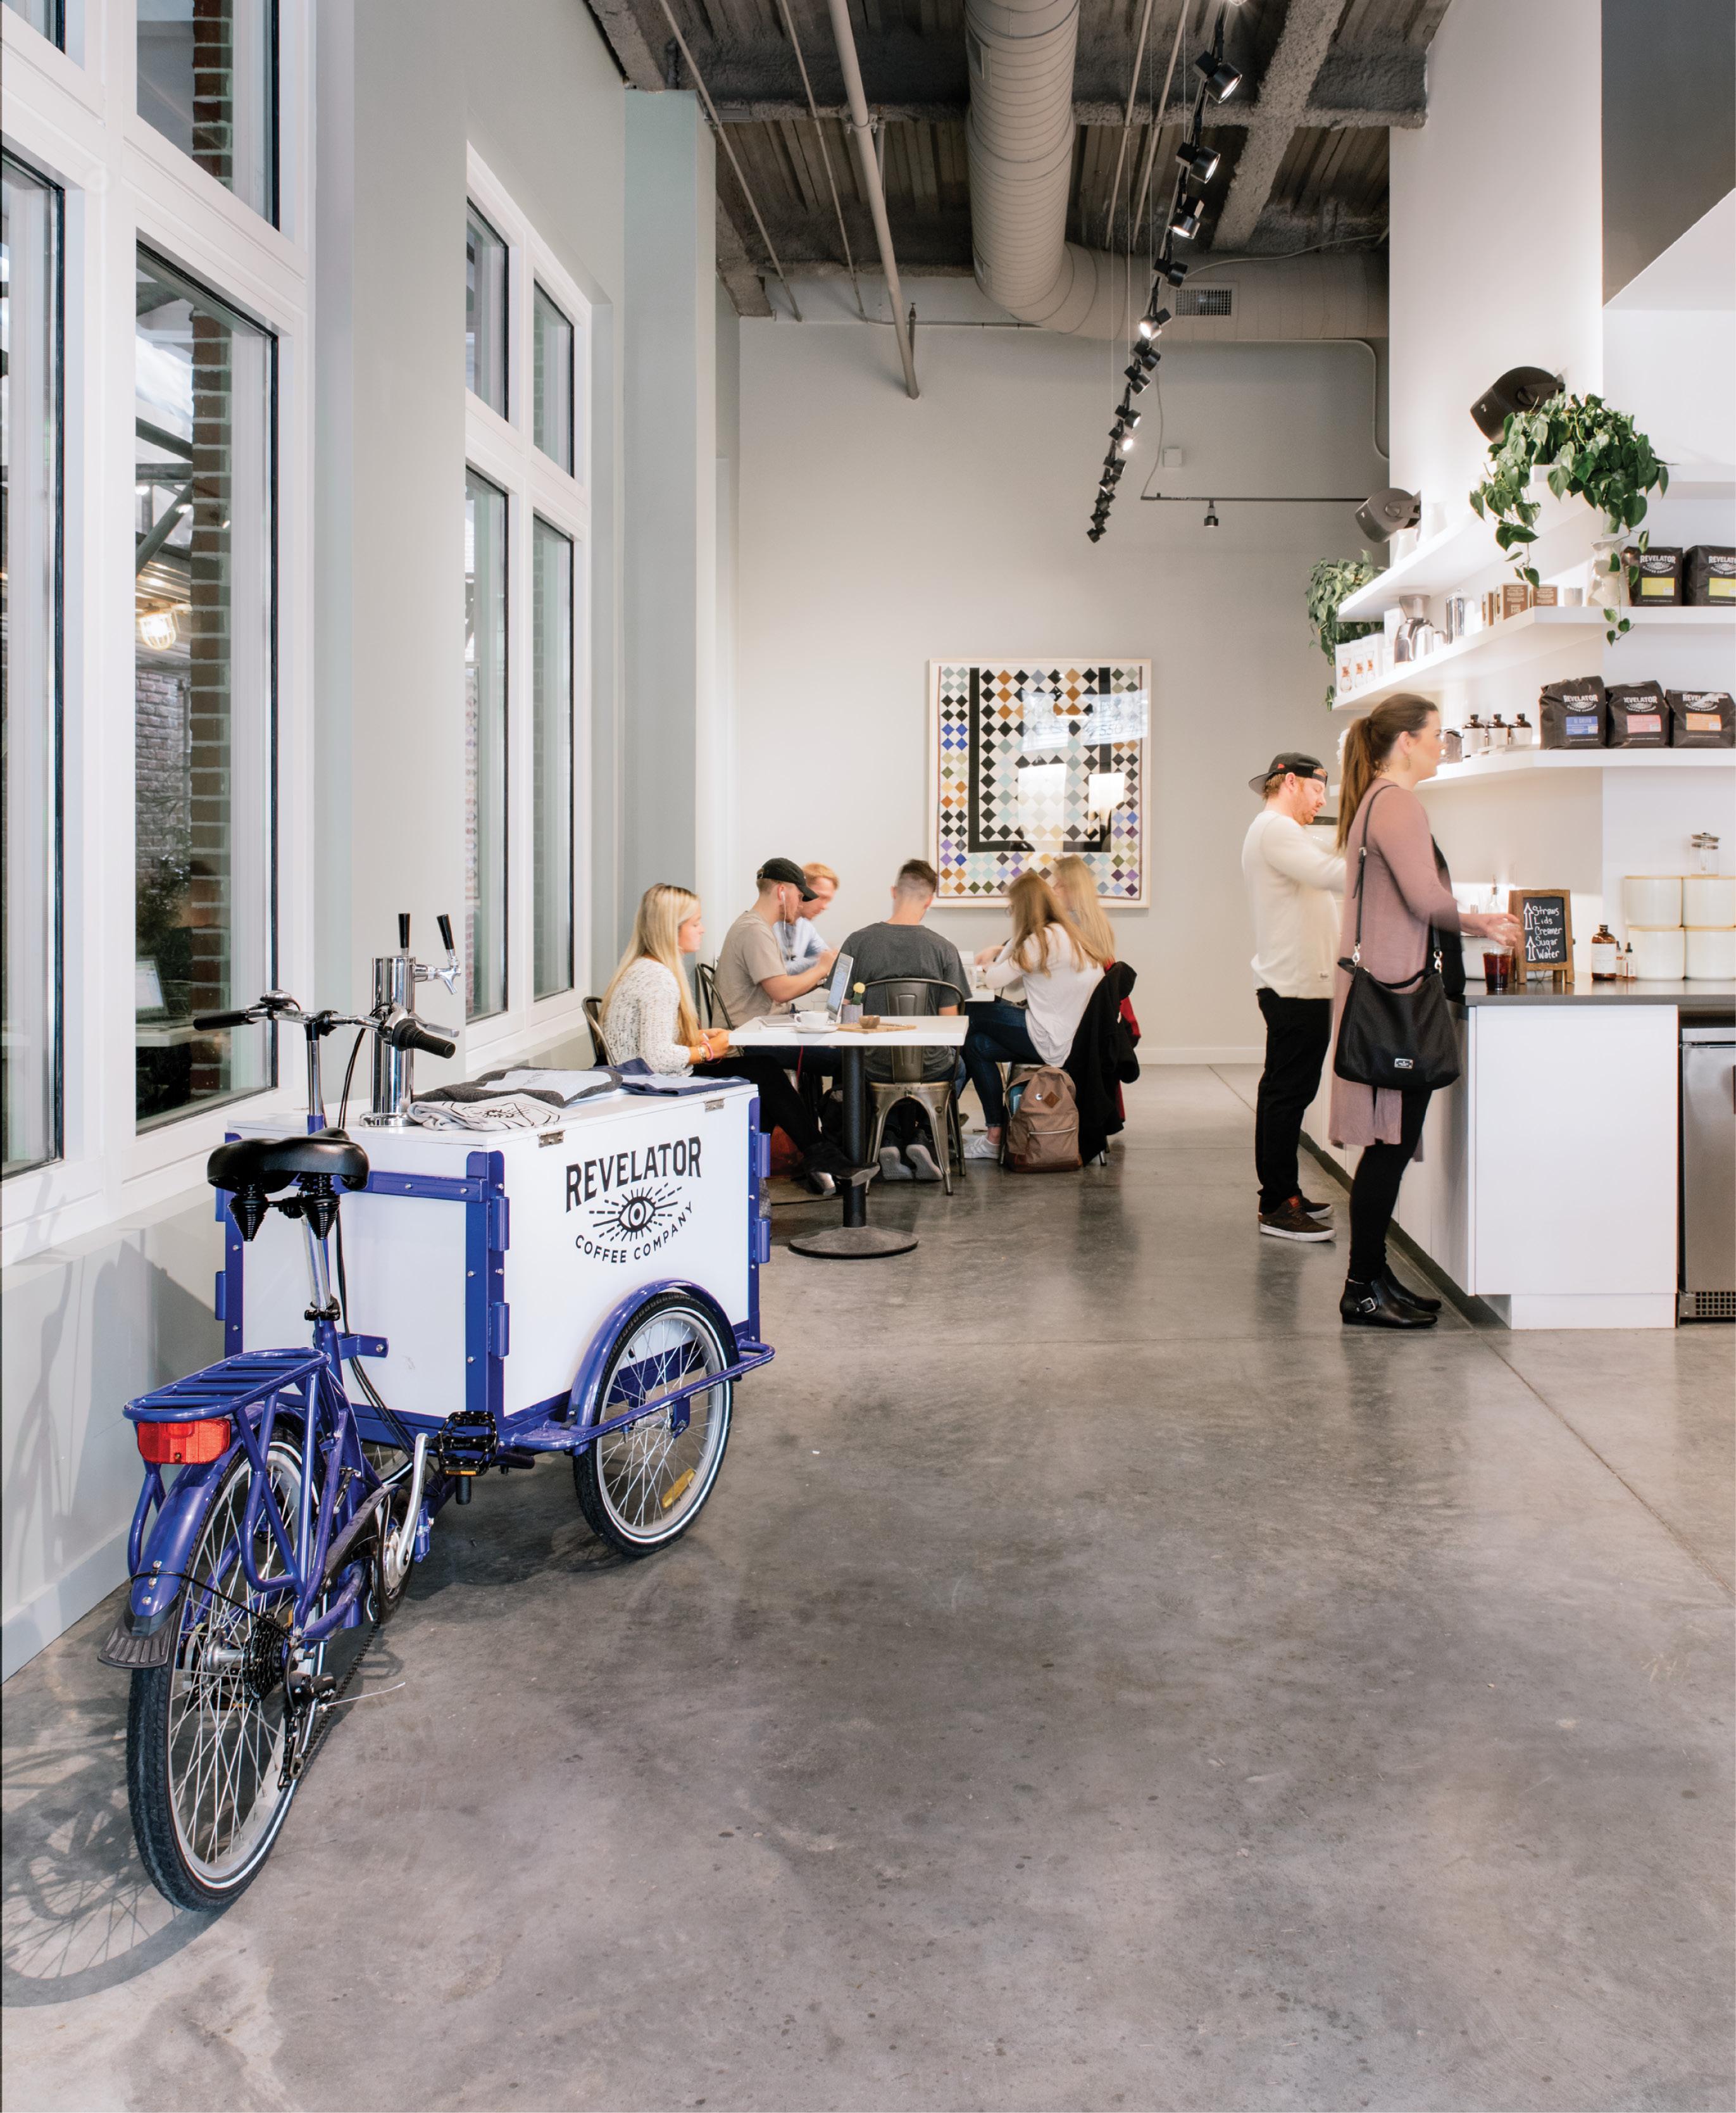 Birmingham-based Revelator opened its airy upper King Street storefront last November, adding to the peninsula's coffee shop blend.